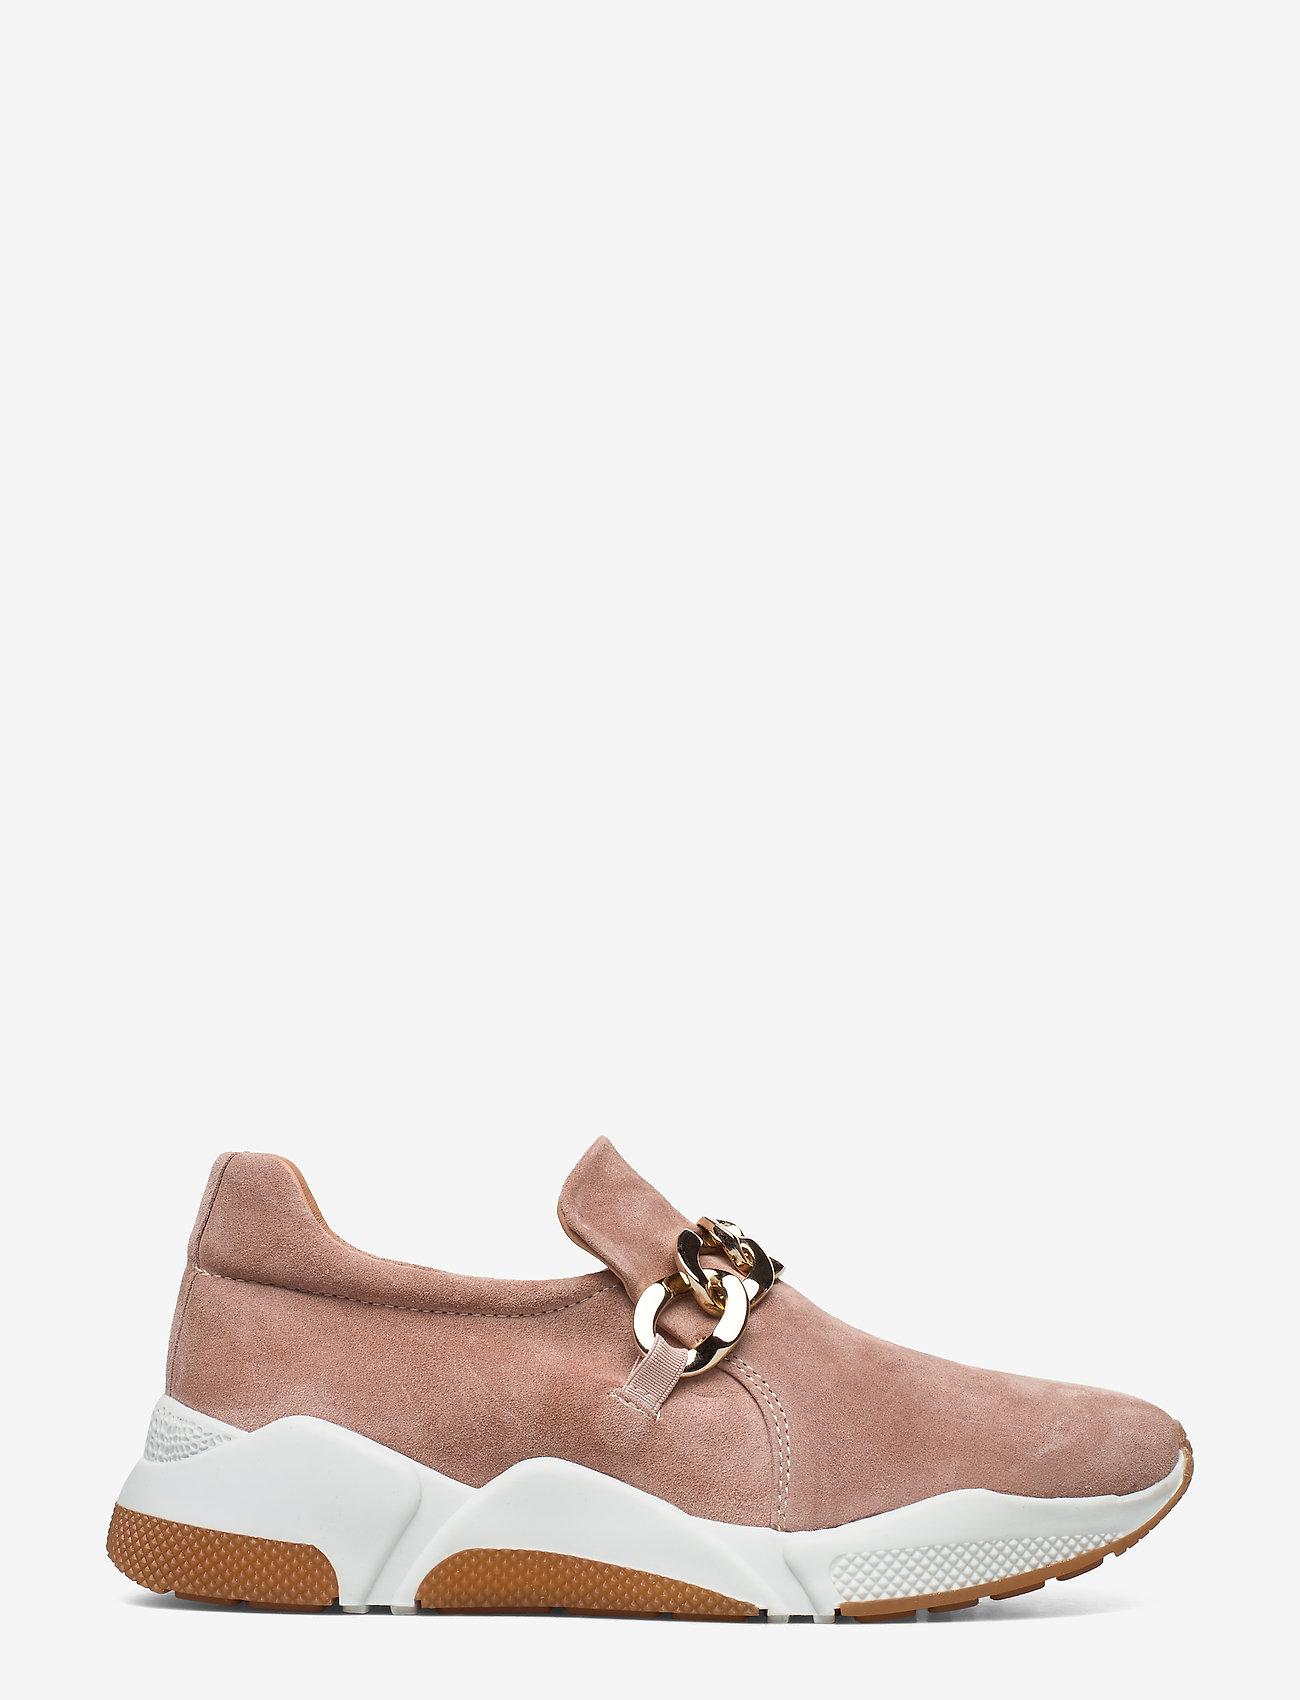 Billi Bi - Sport 4281 - slip-on sneakers - nude babysilk/gold 558 - 1